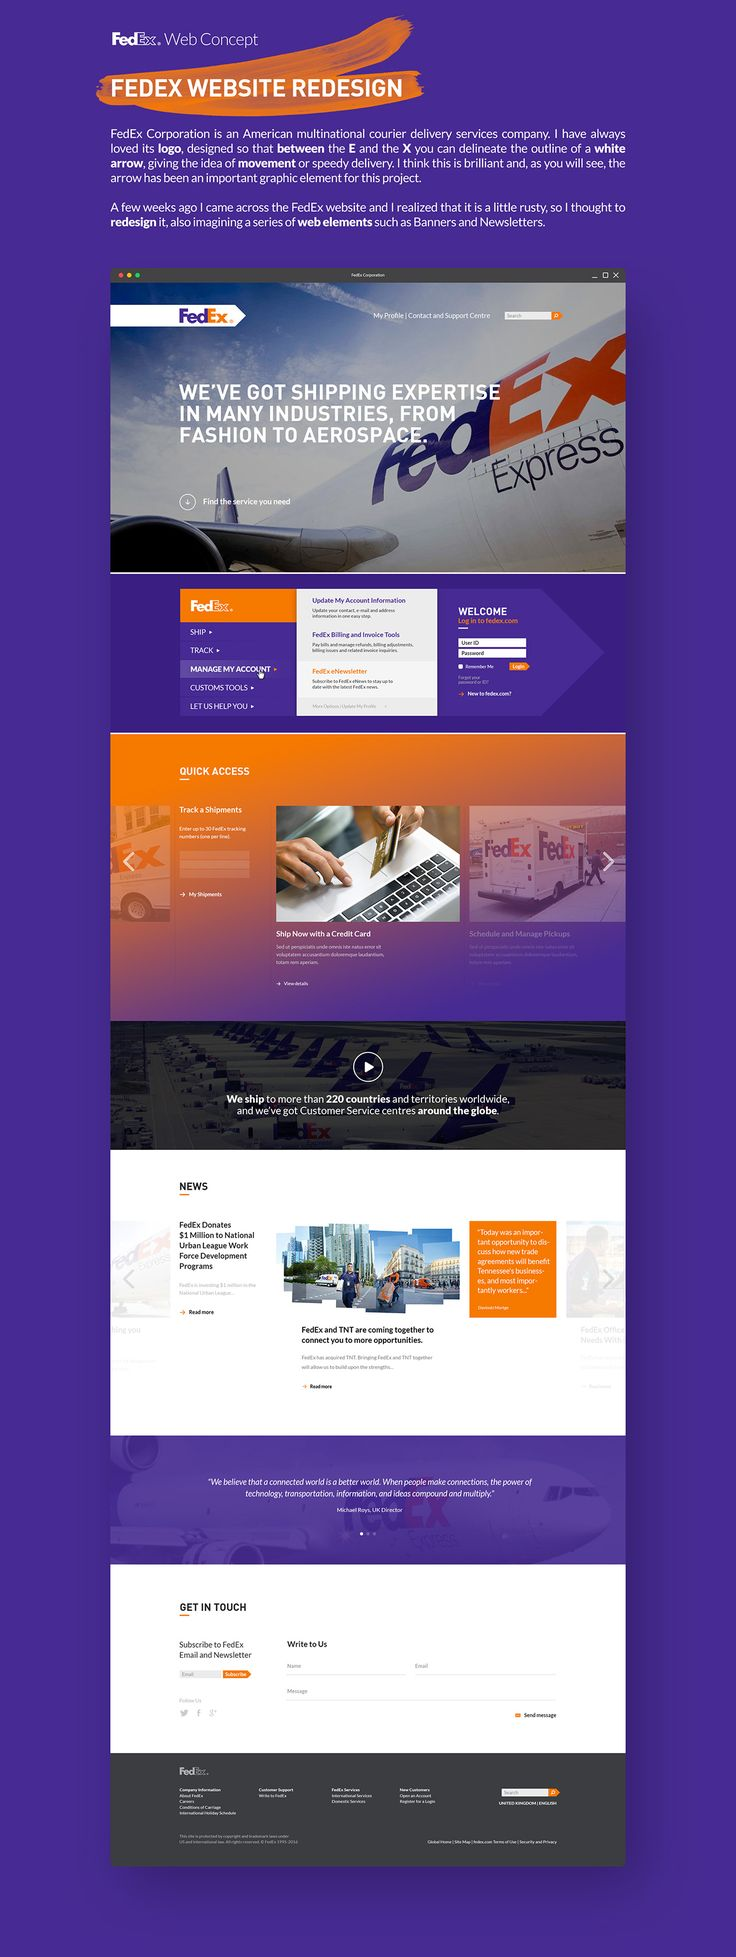 FedEx Web Concept on Behance (con imágenes) S. a